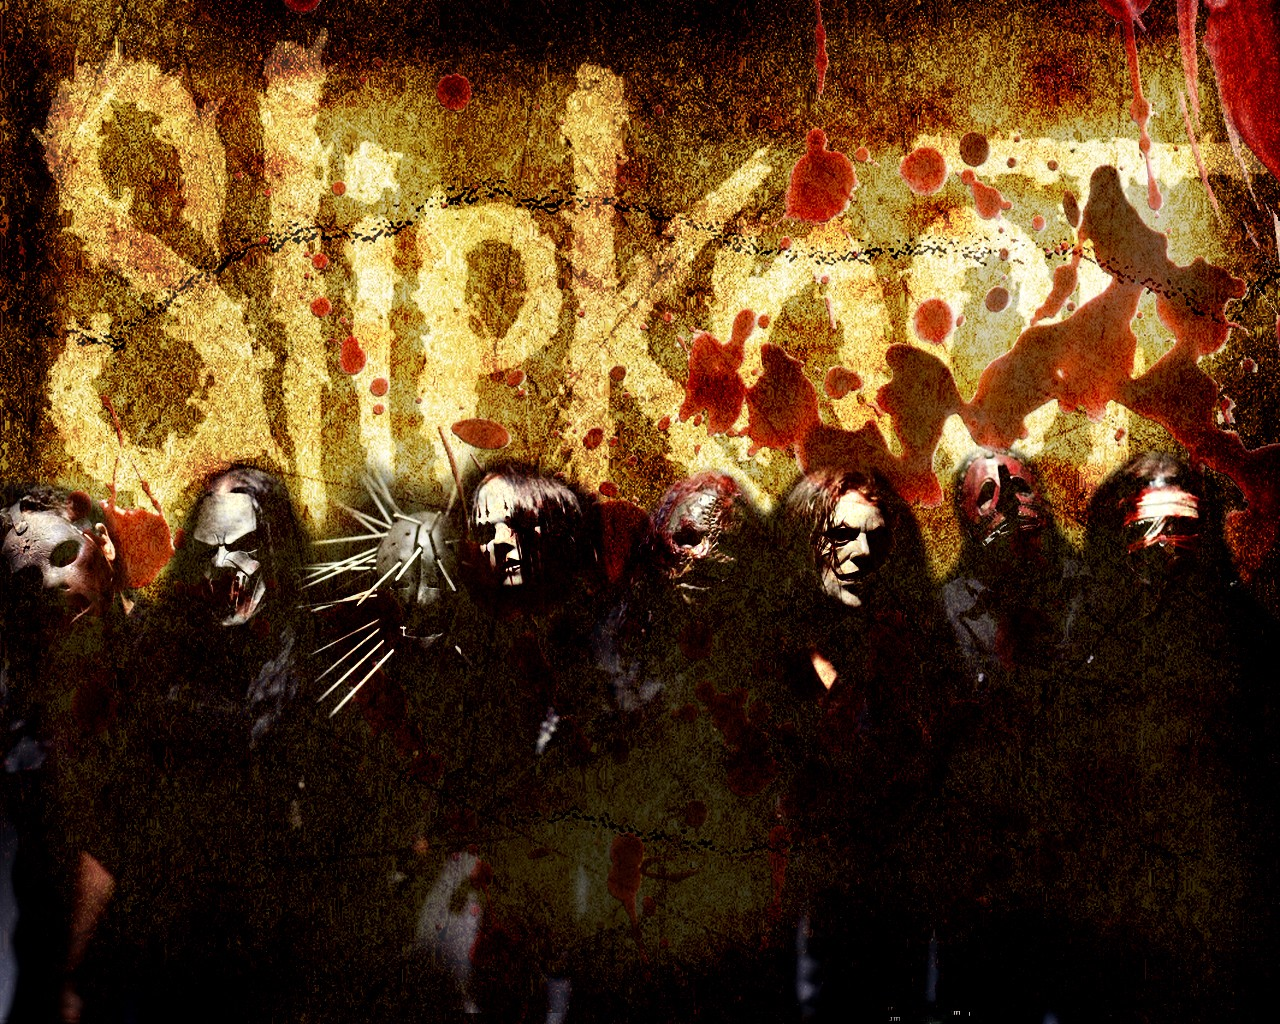 Slipknot wallpapers desktop wallpaper pictures Slipknot wallpapers 1280x1024